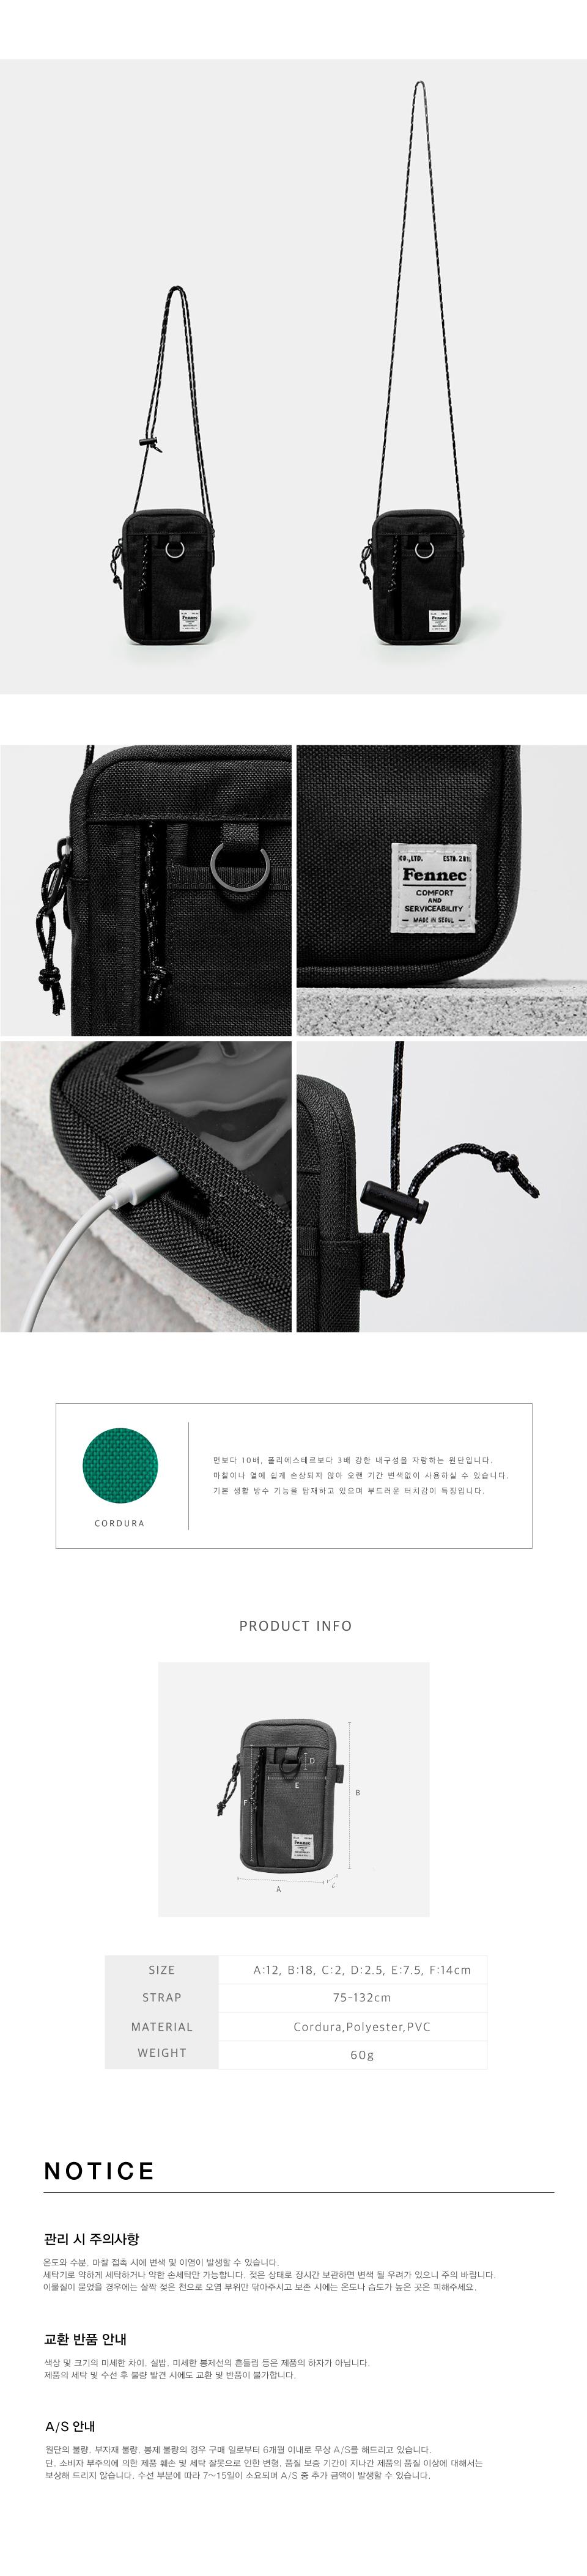 C_S-micro-bag-bk2.jpg